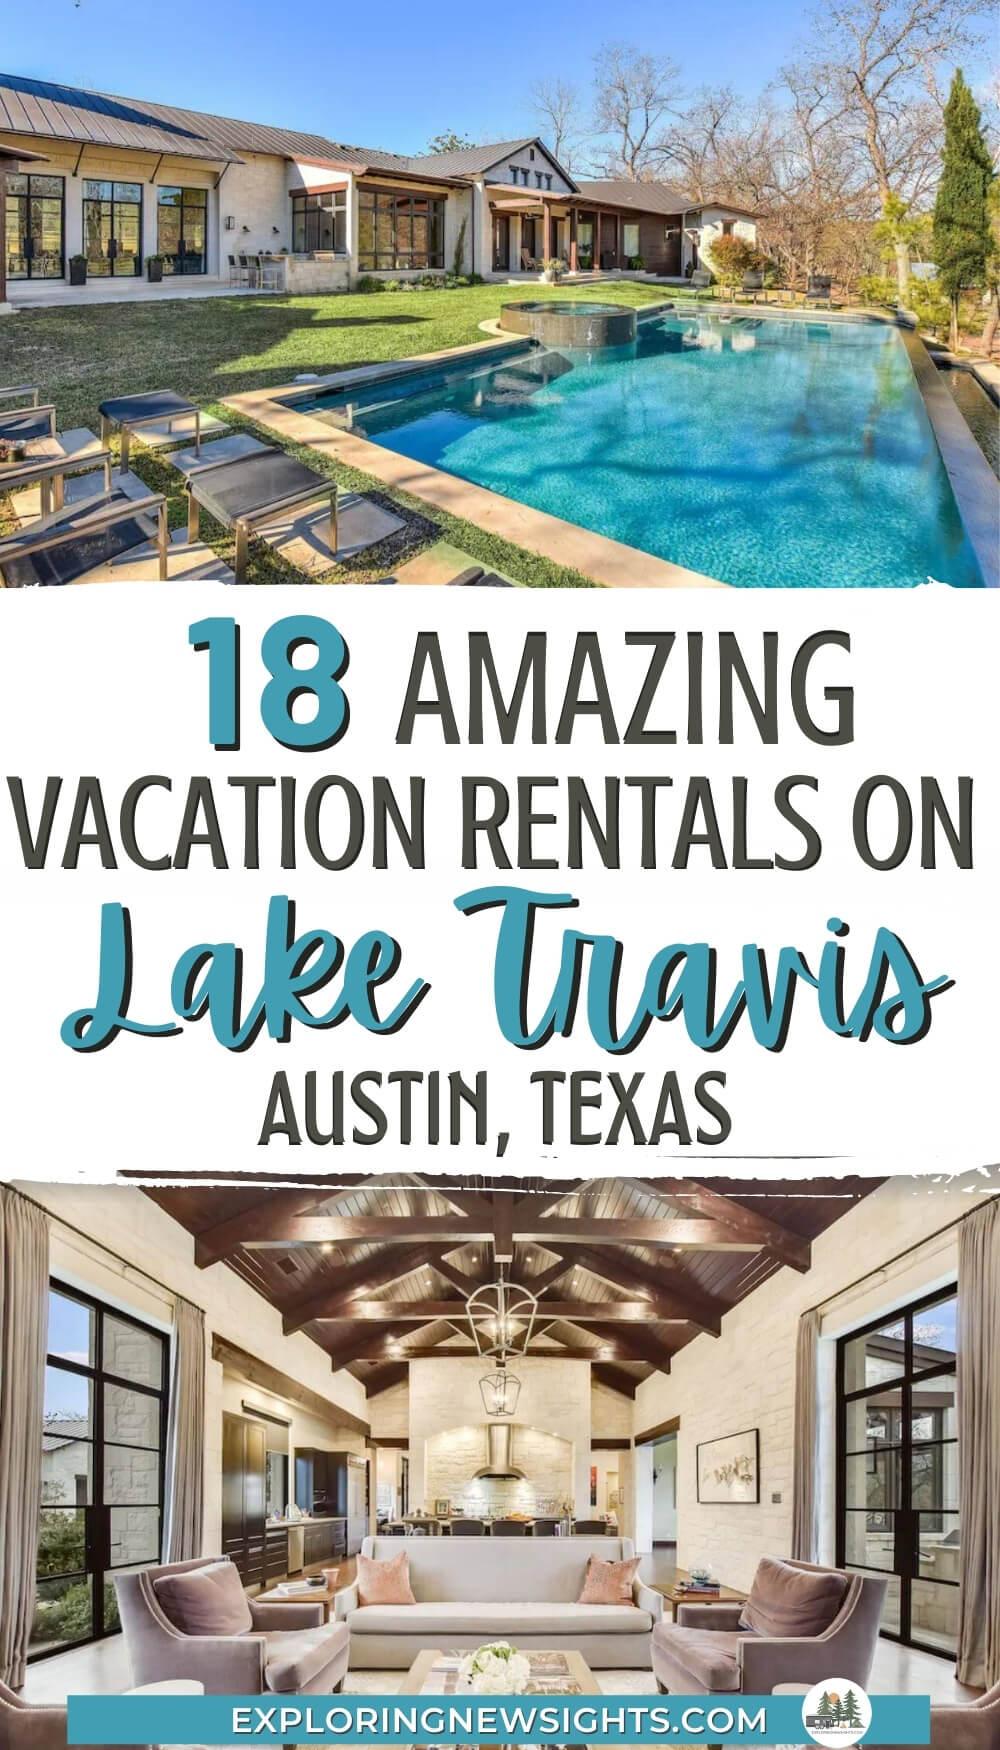 Vacation Rentals on Lake Travis